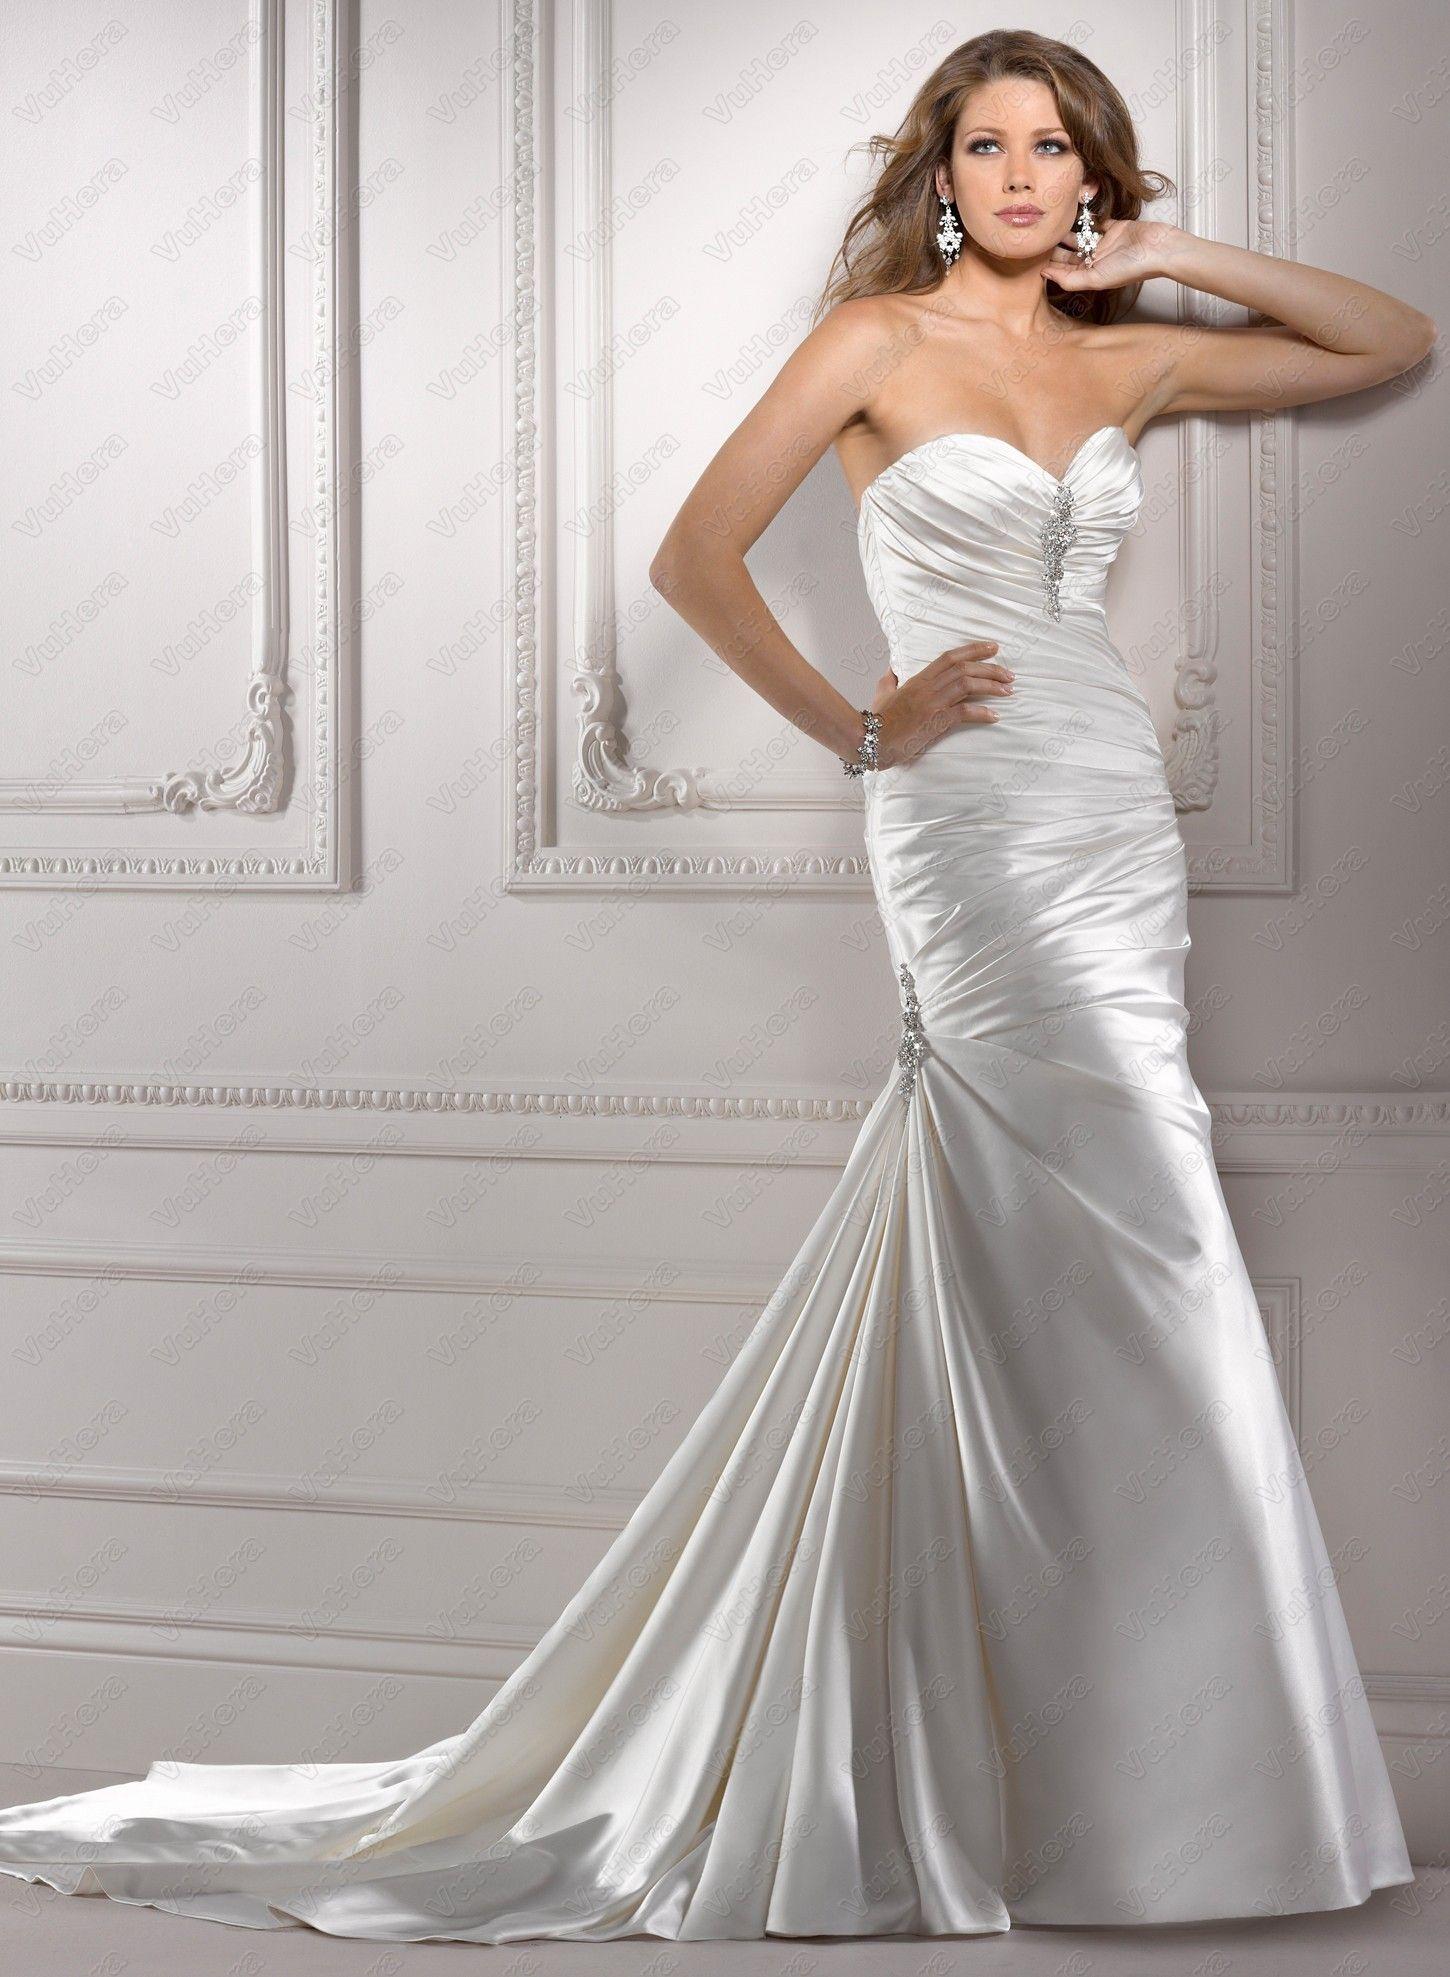 Stretch Satin Sweetheart Neckline Fit And Flare Sheath Wedding Dress